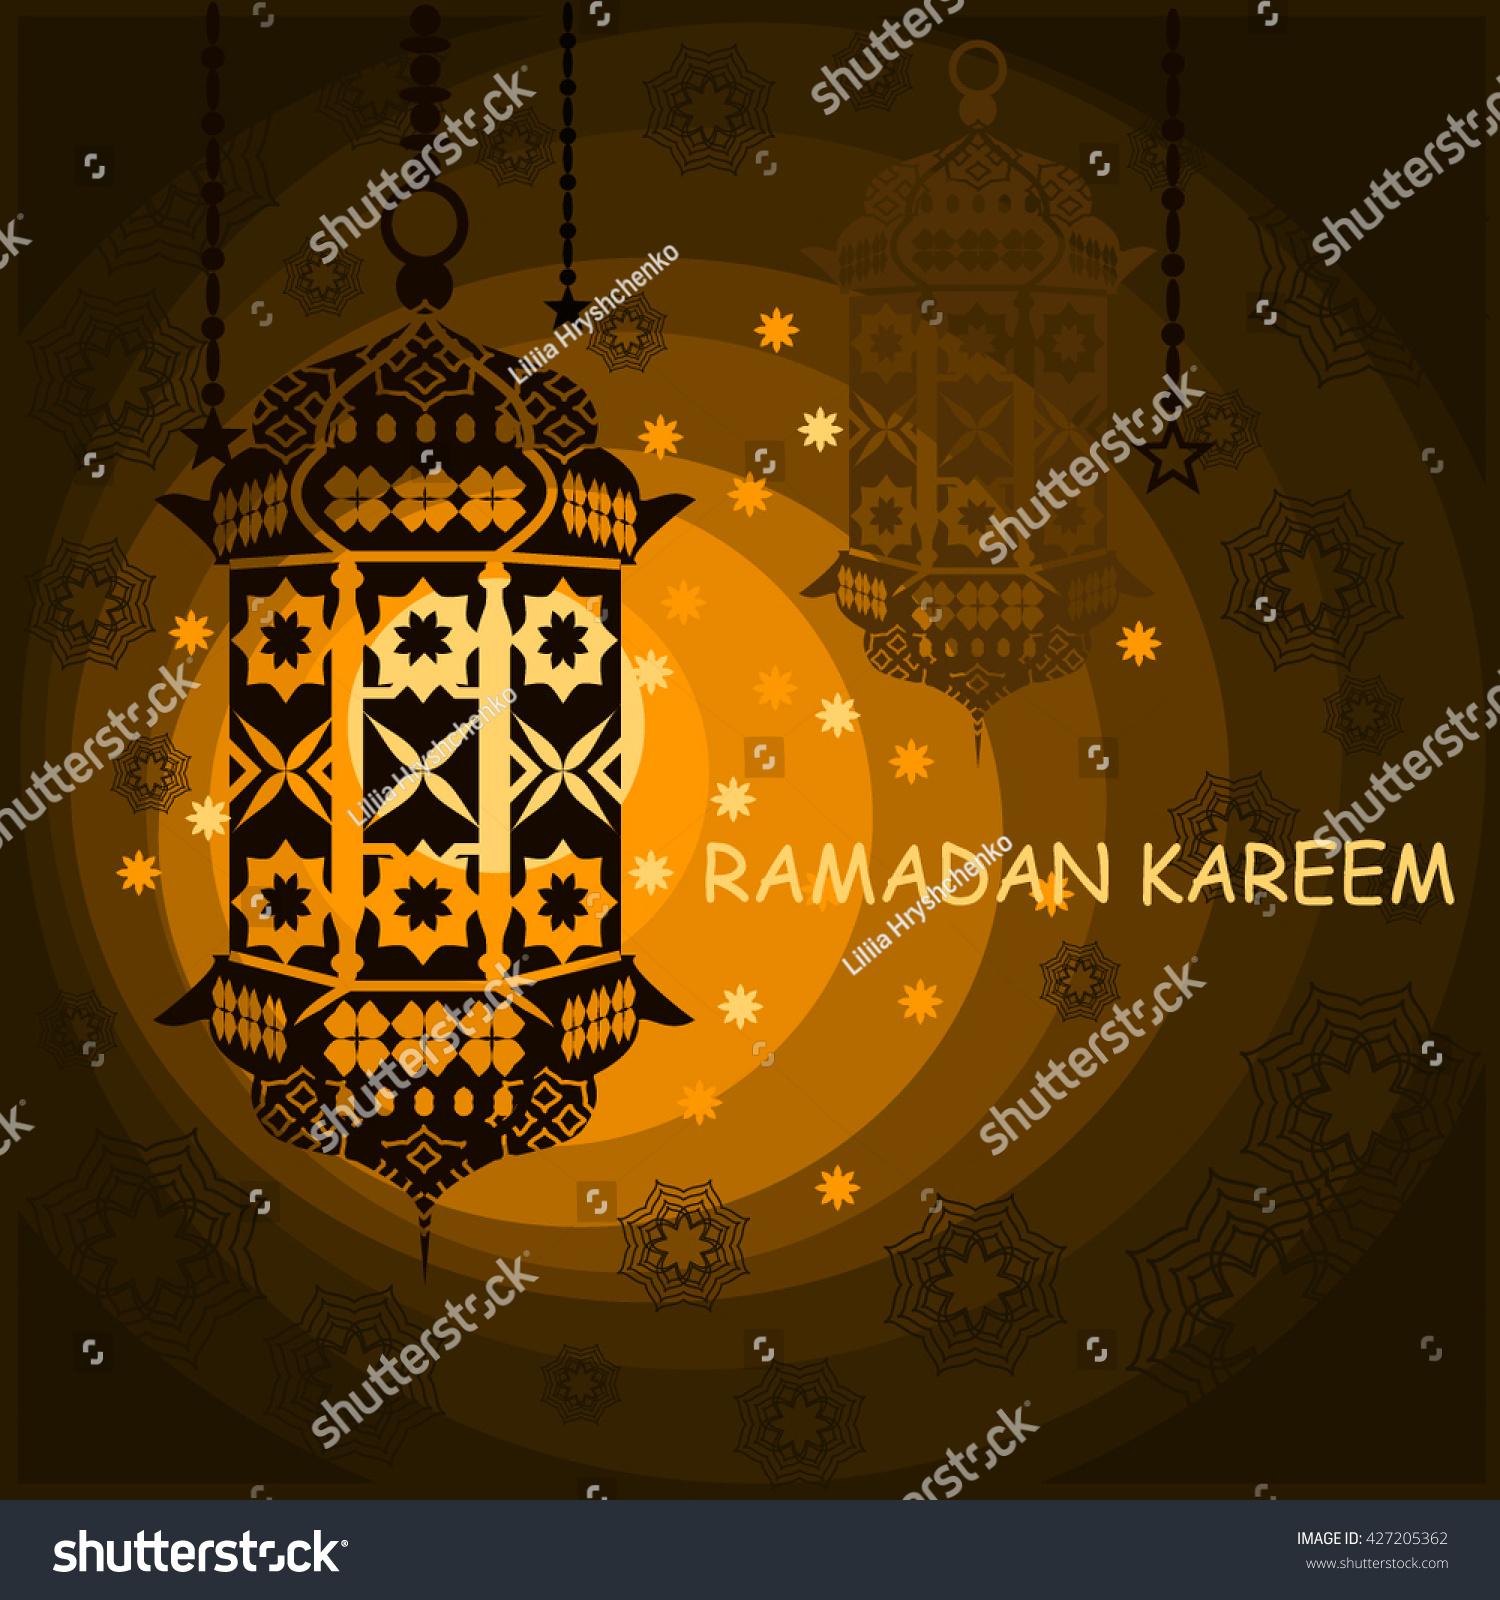 Ramadan kareem happy ramadan islamic greeting stock vector 427205362 islamic greeting card kristyandbryce Image collections